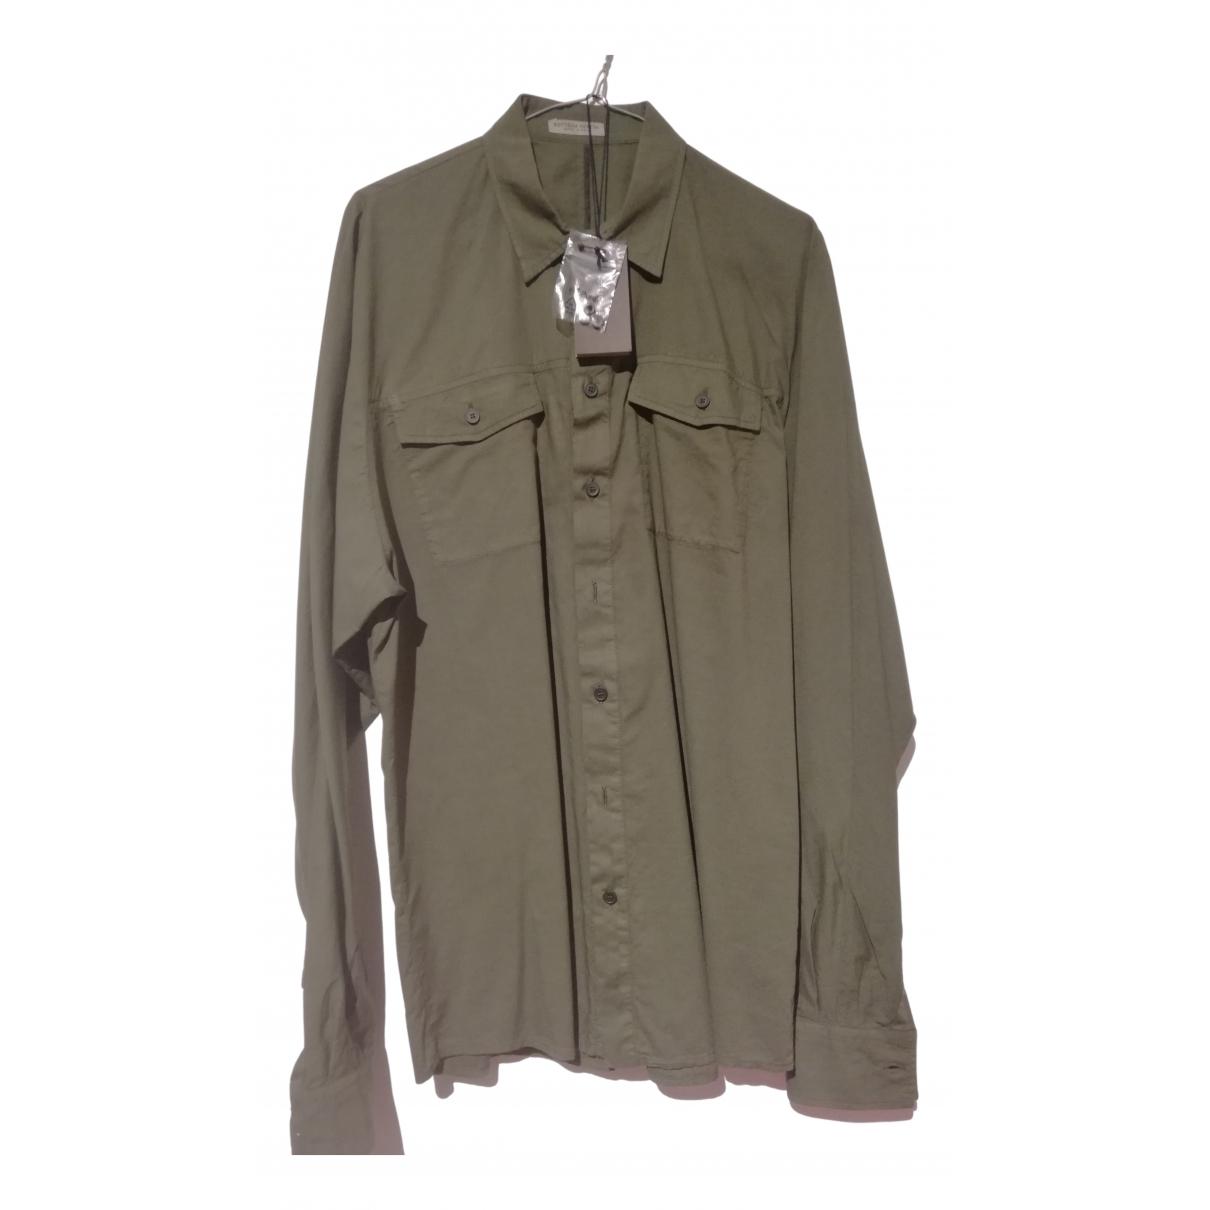 Bottega Veneta N Green Cotton Shirts for Men M International